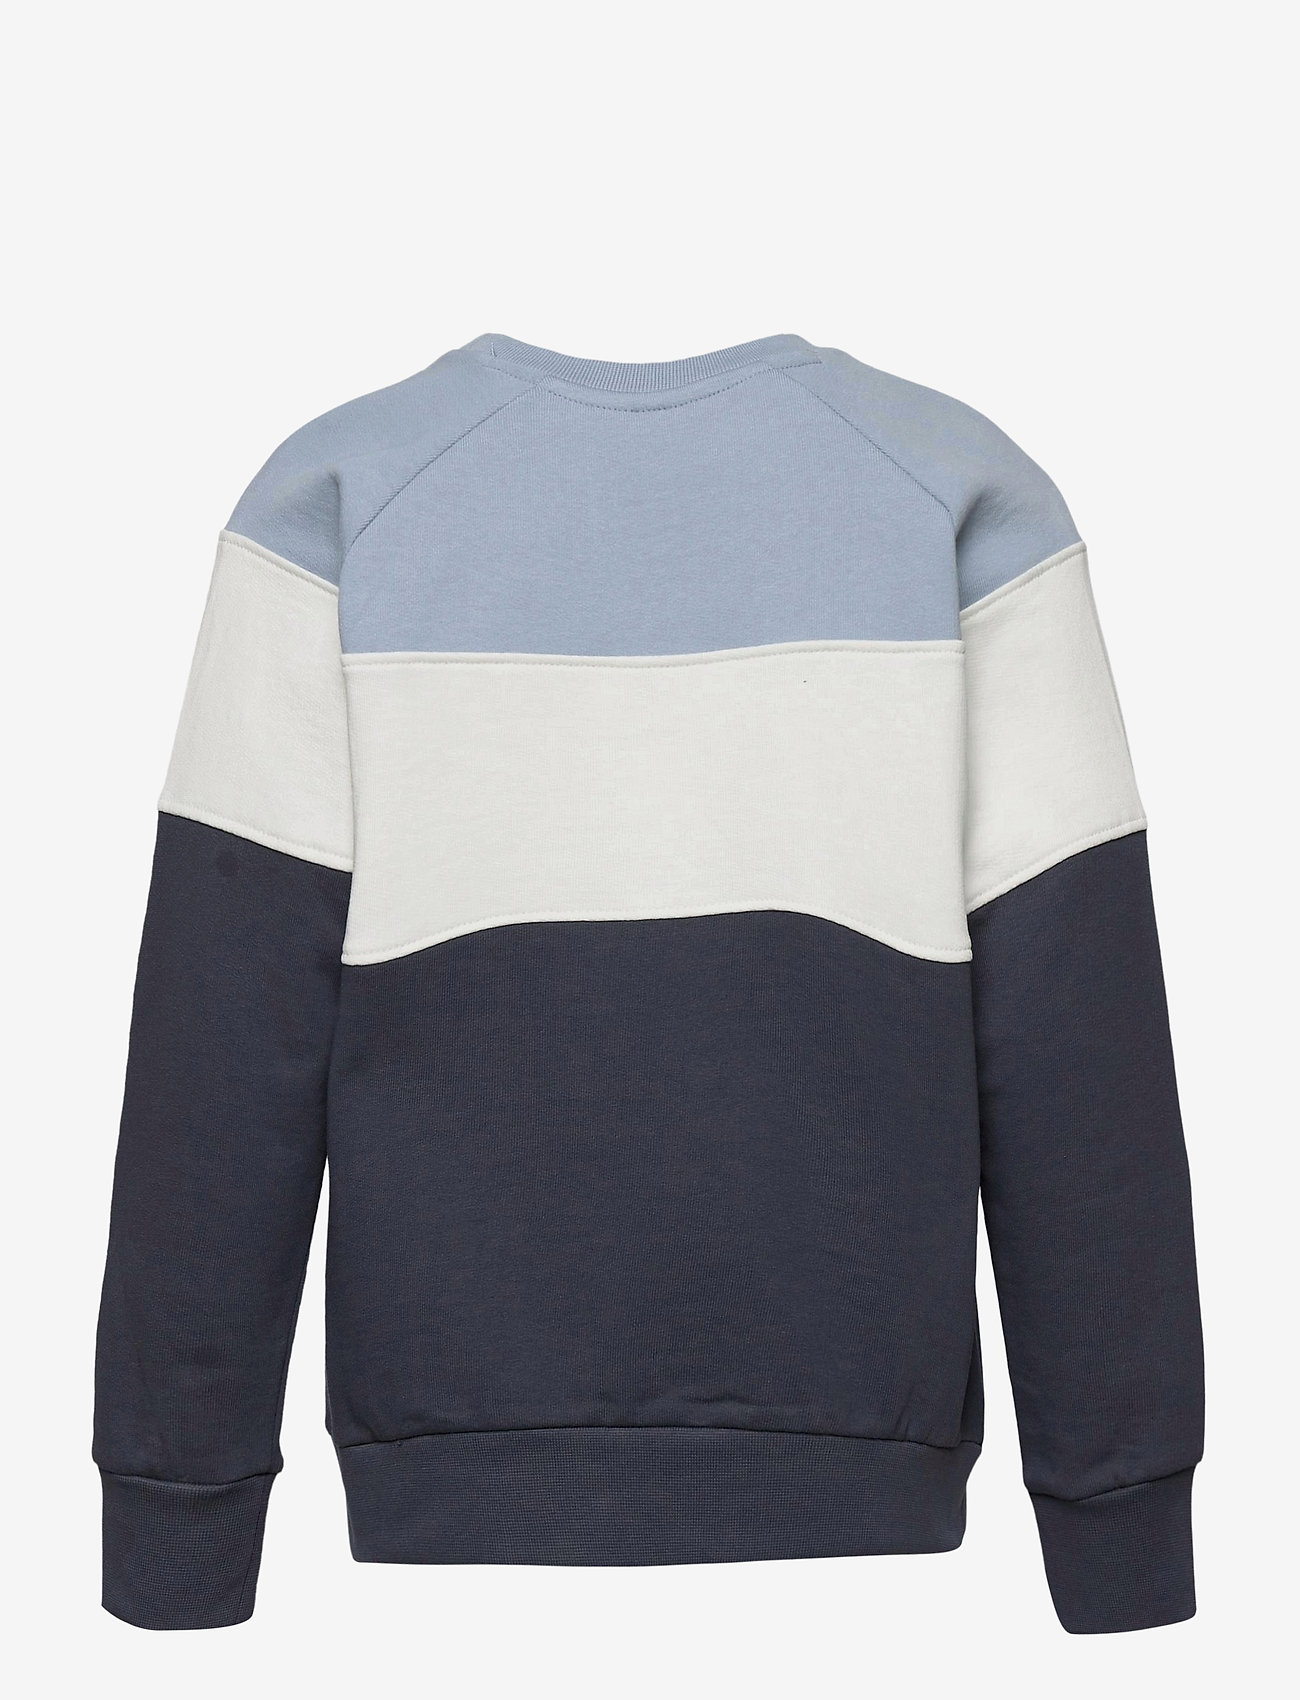 Hummel - hmlCLAES SWEATSHIRT - sweatshirts - blue fog - 1